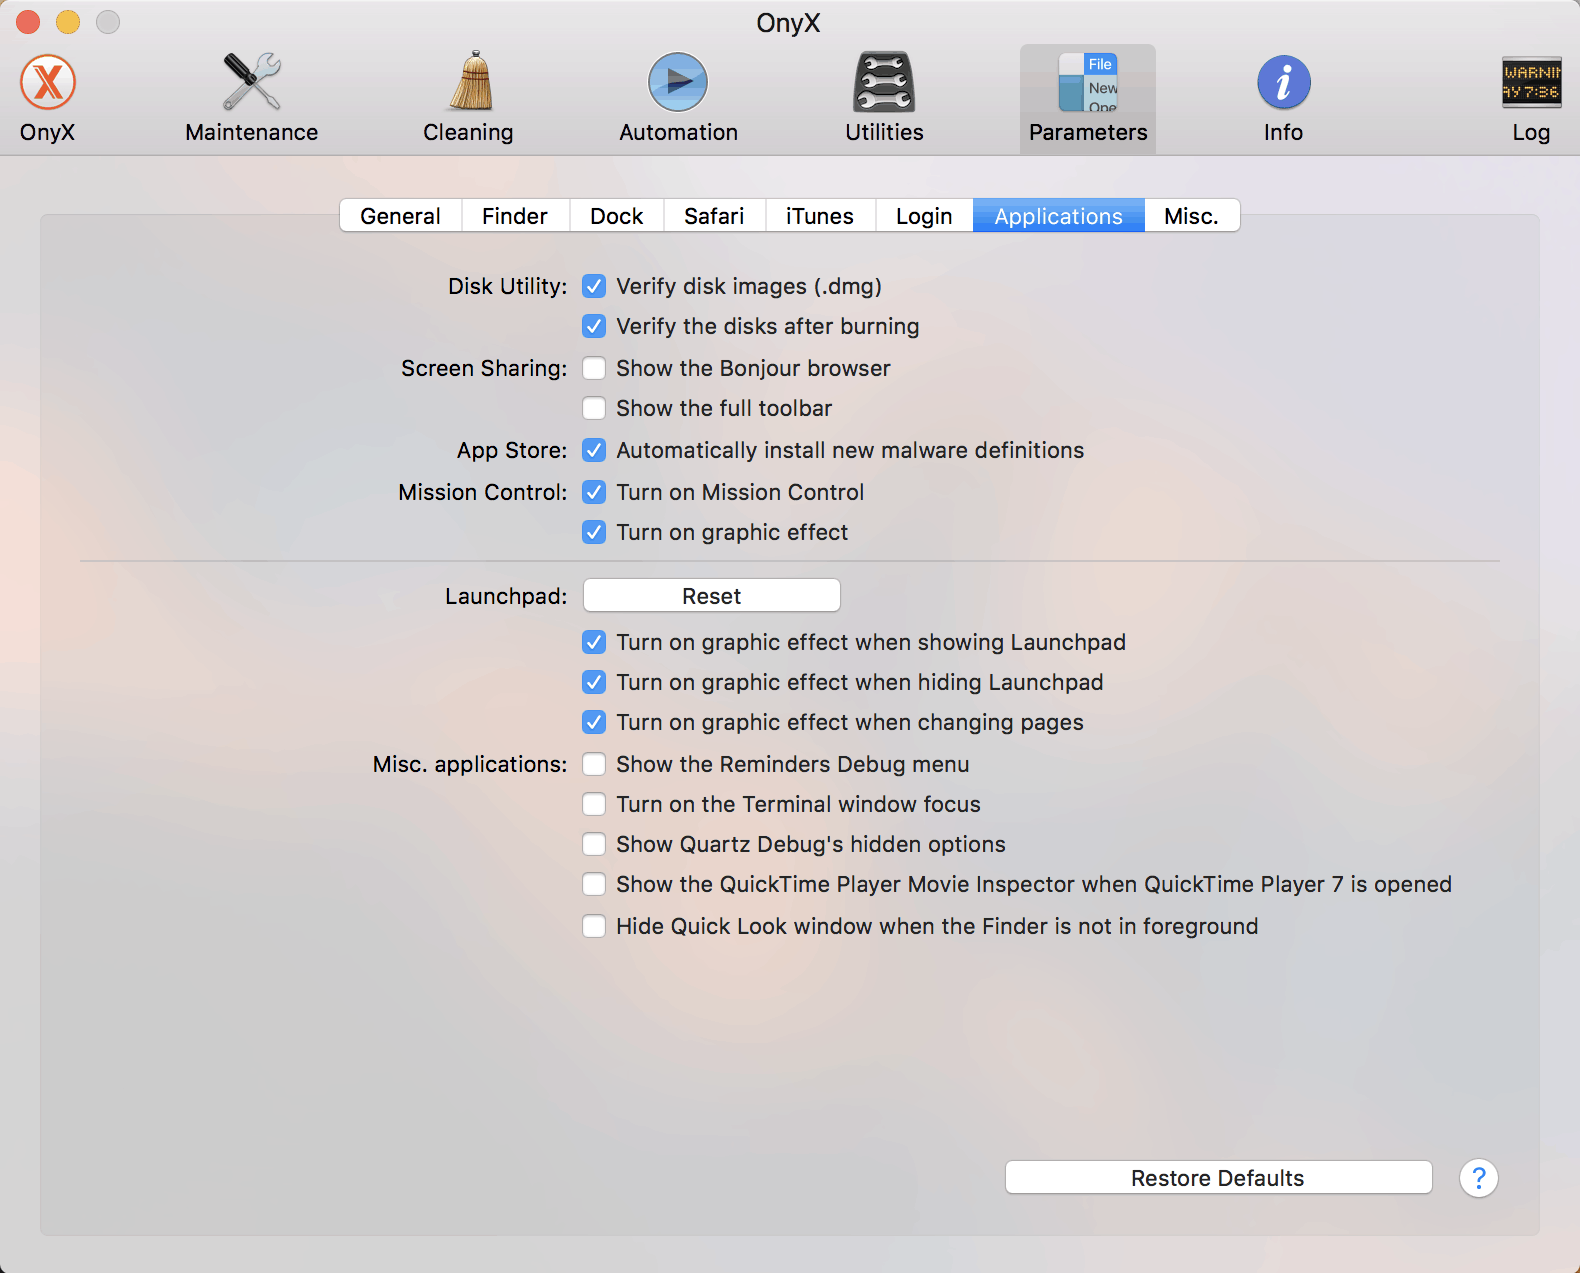 App Setting Preferences